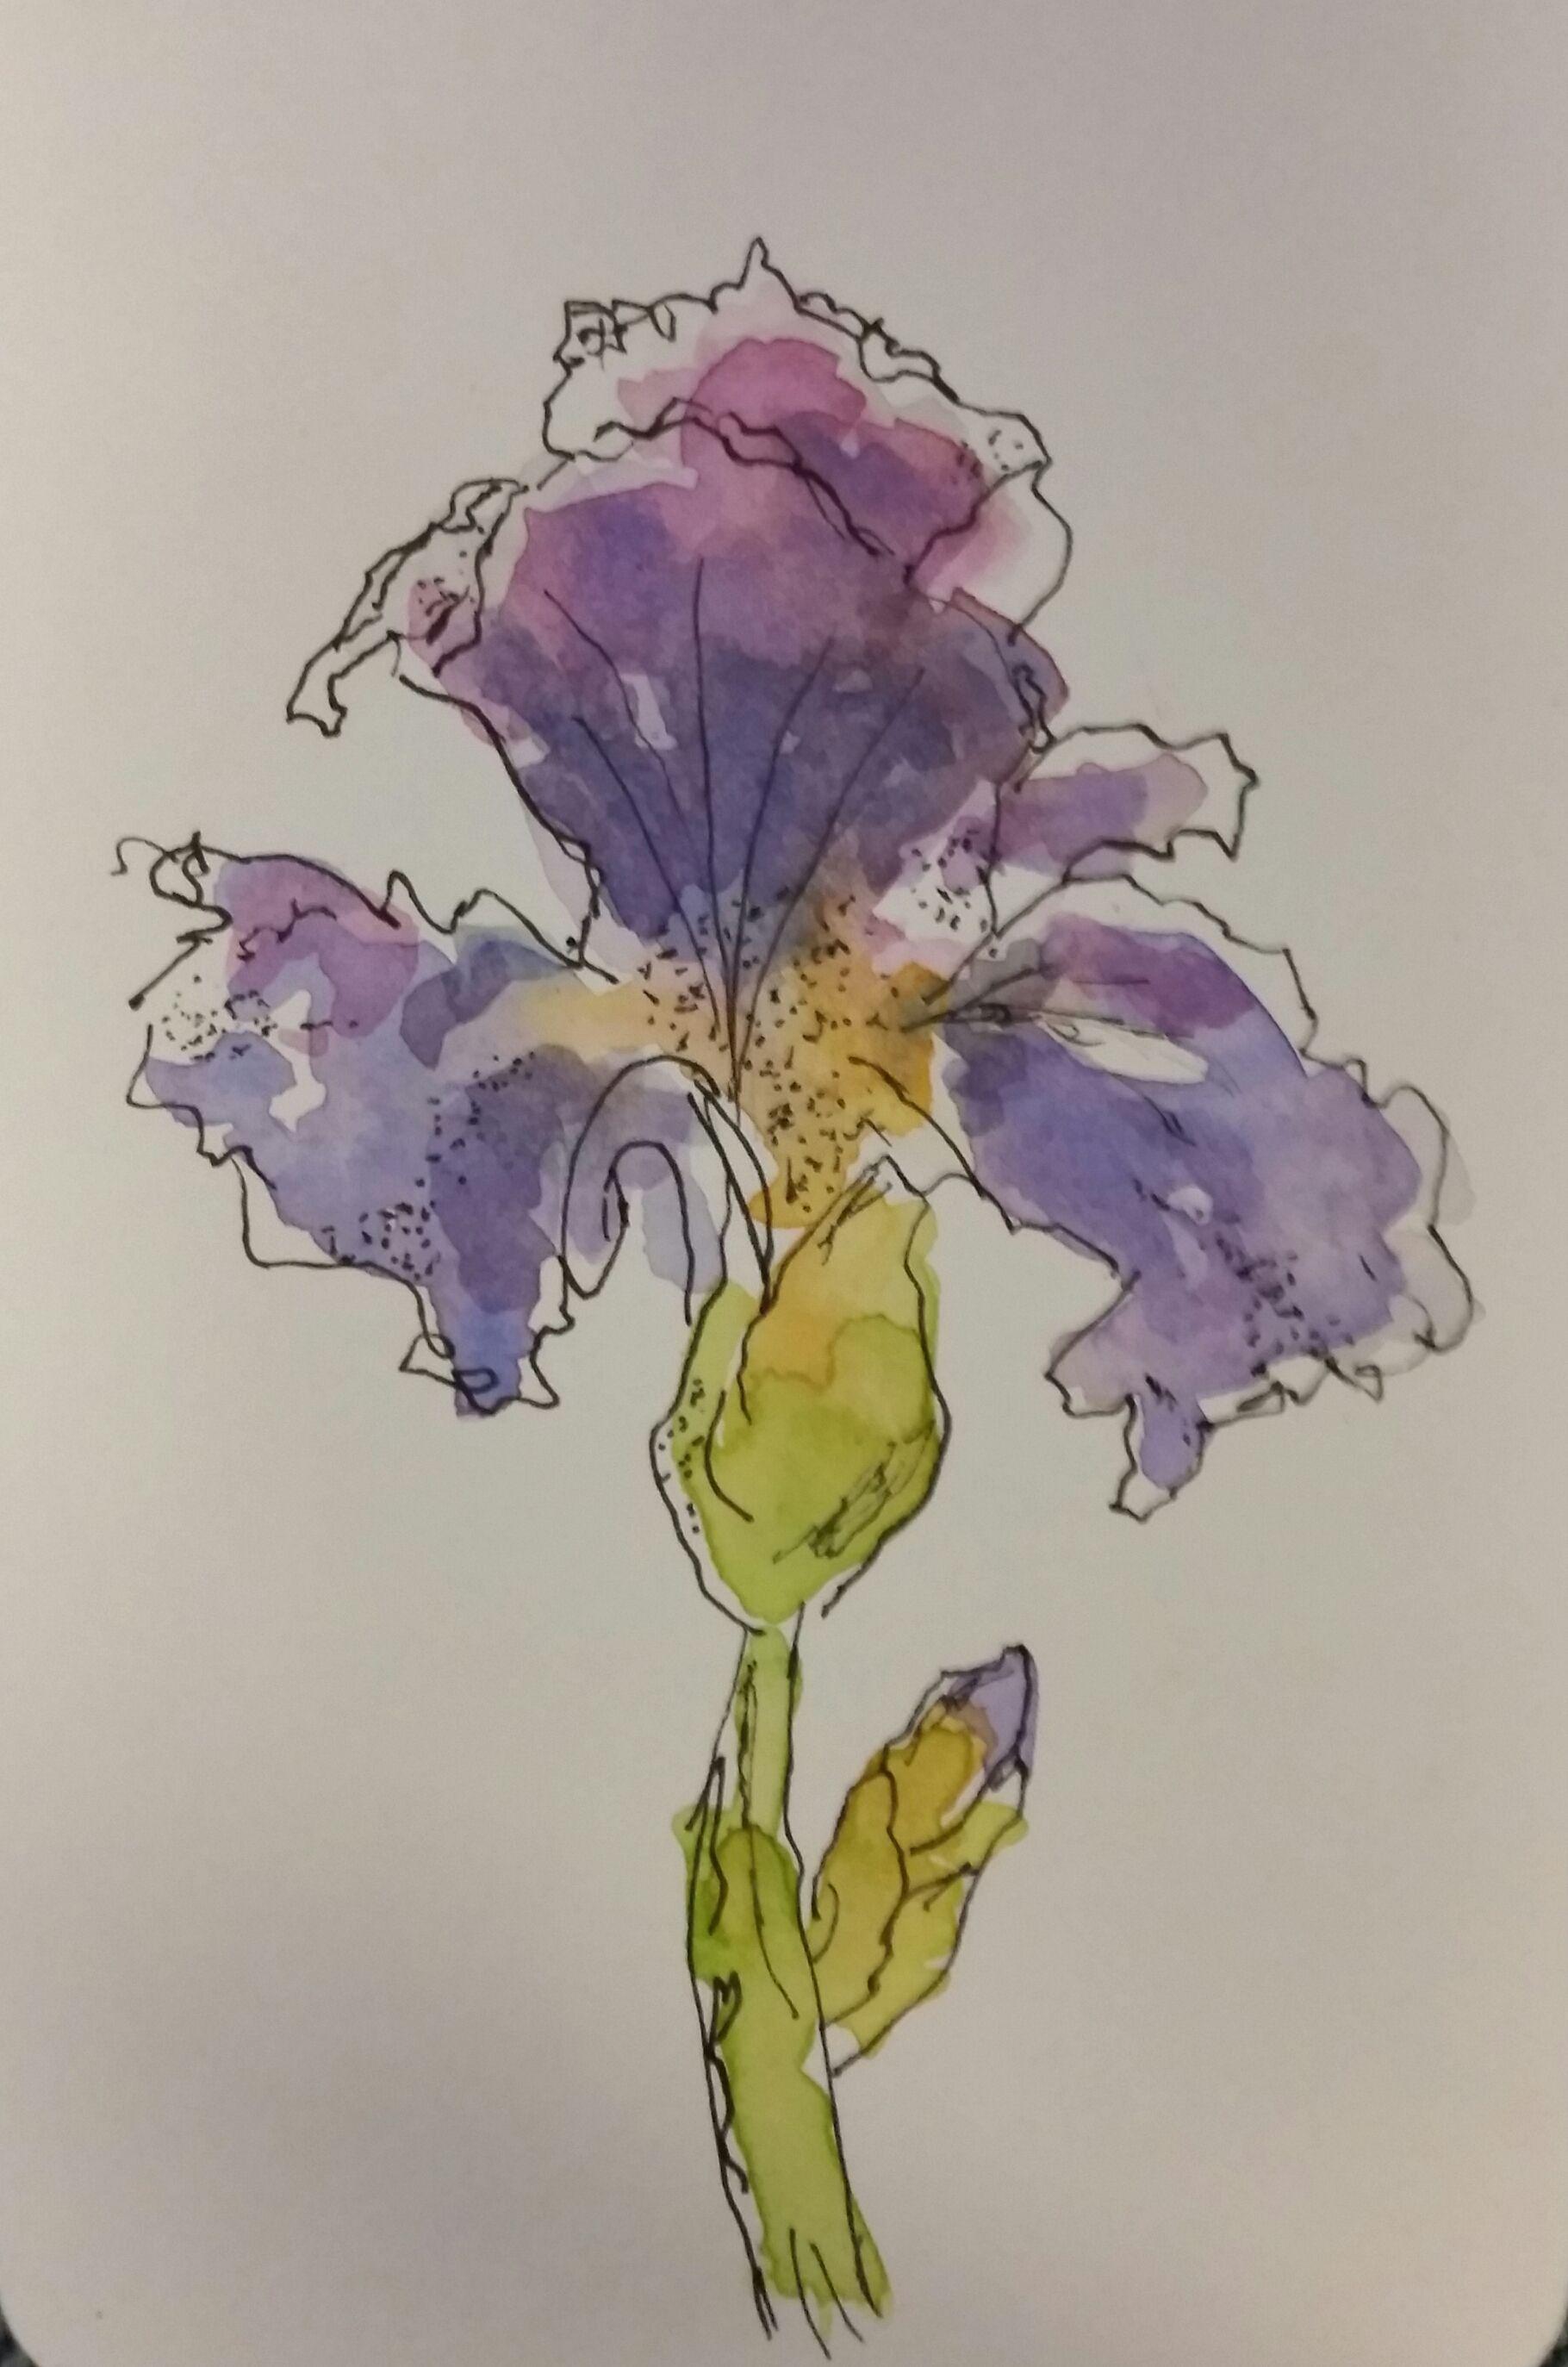 Purple Iris Watercolor And Pen Iris Drawing Watercolor Pen And Watercolor